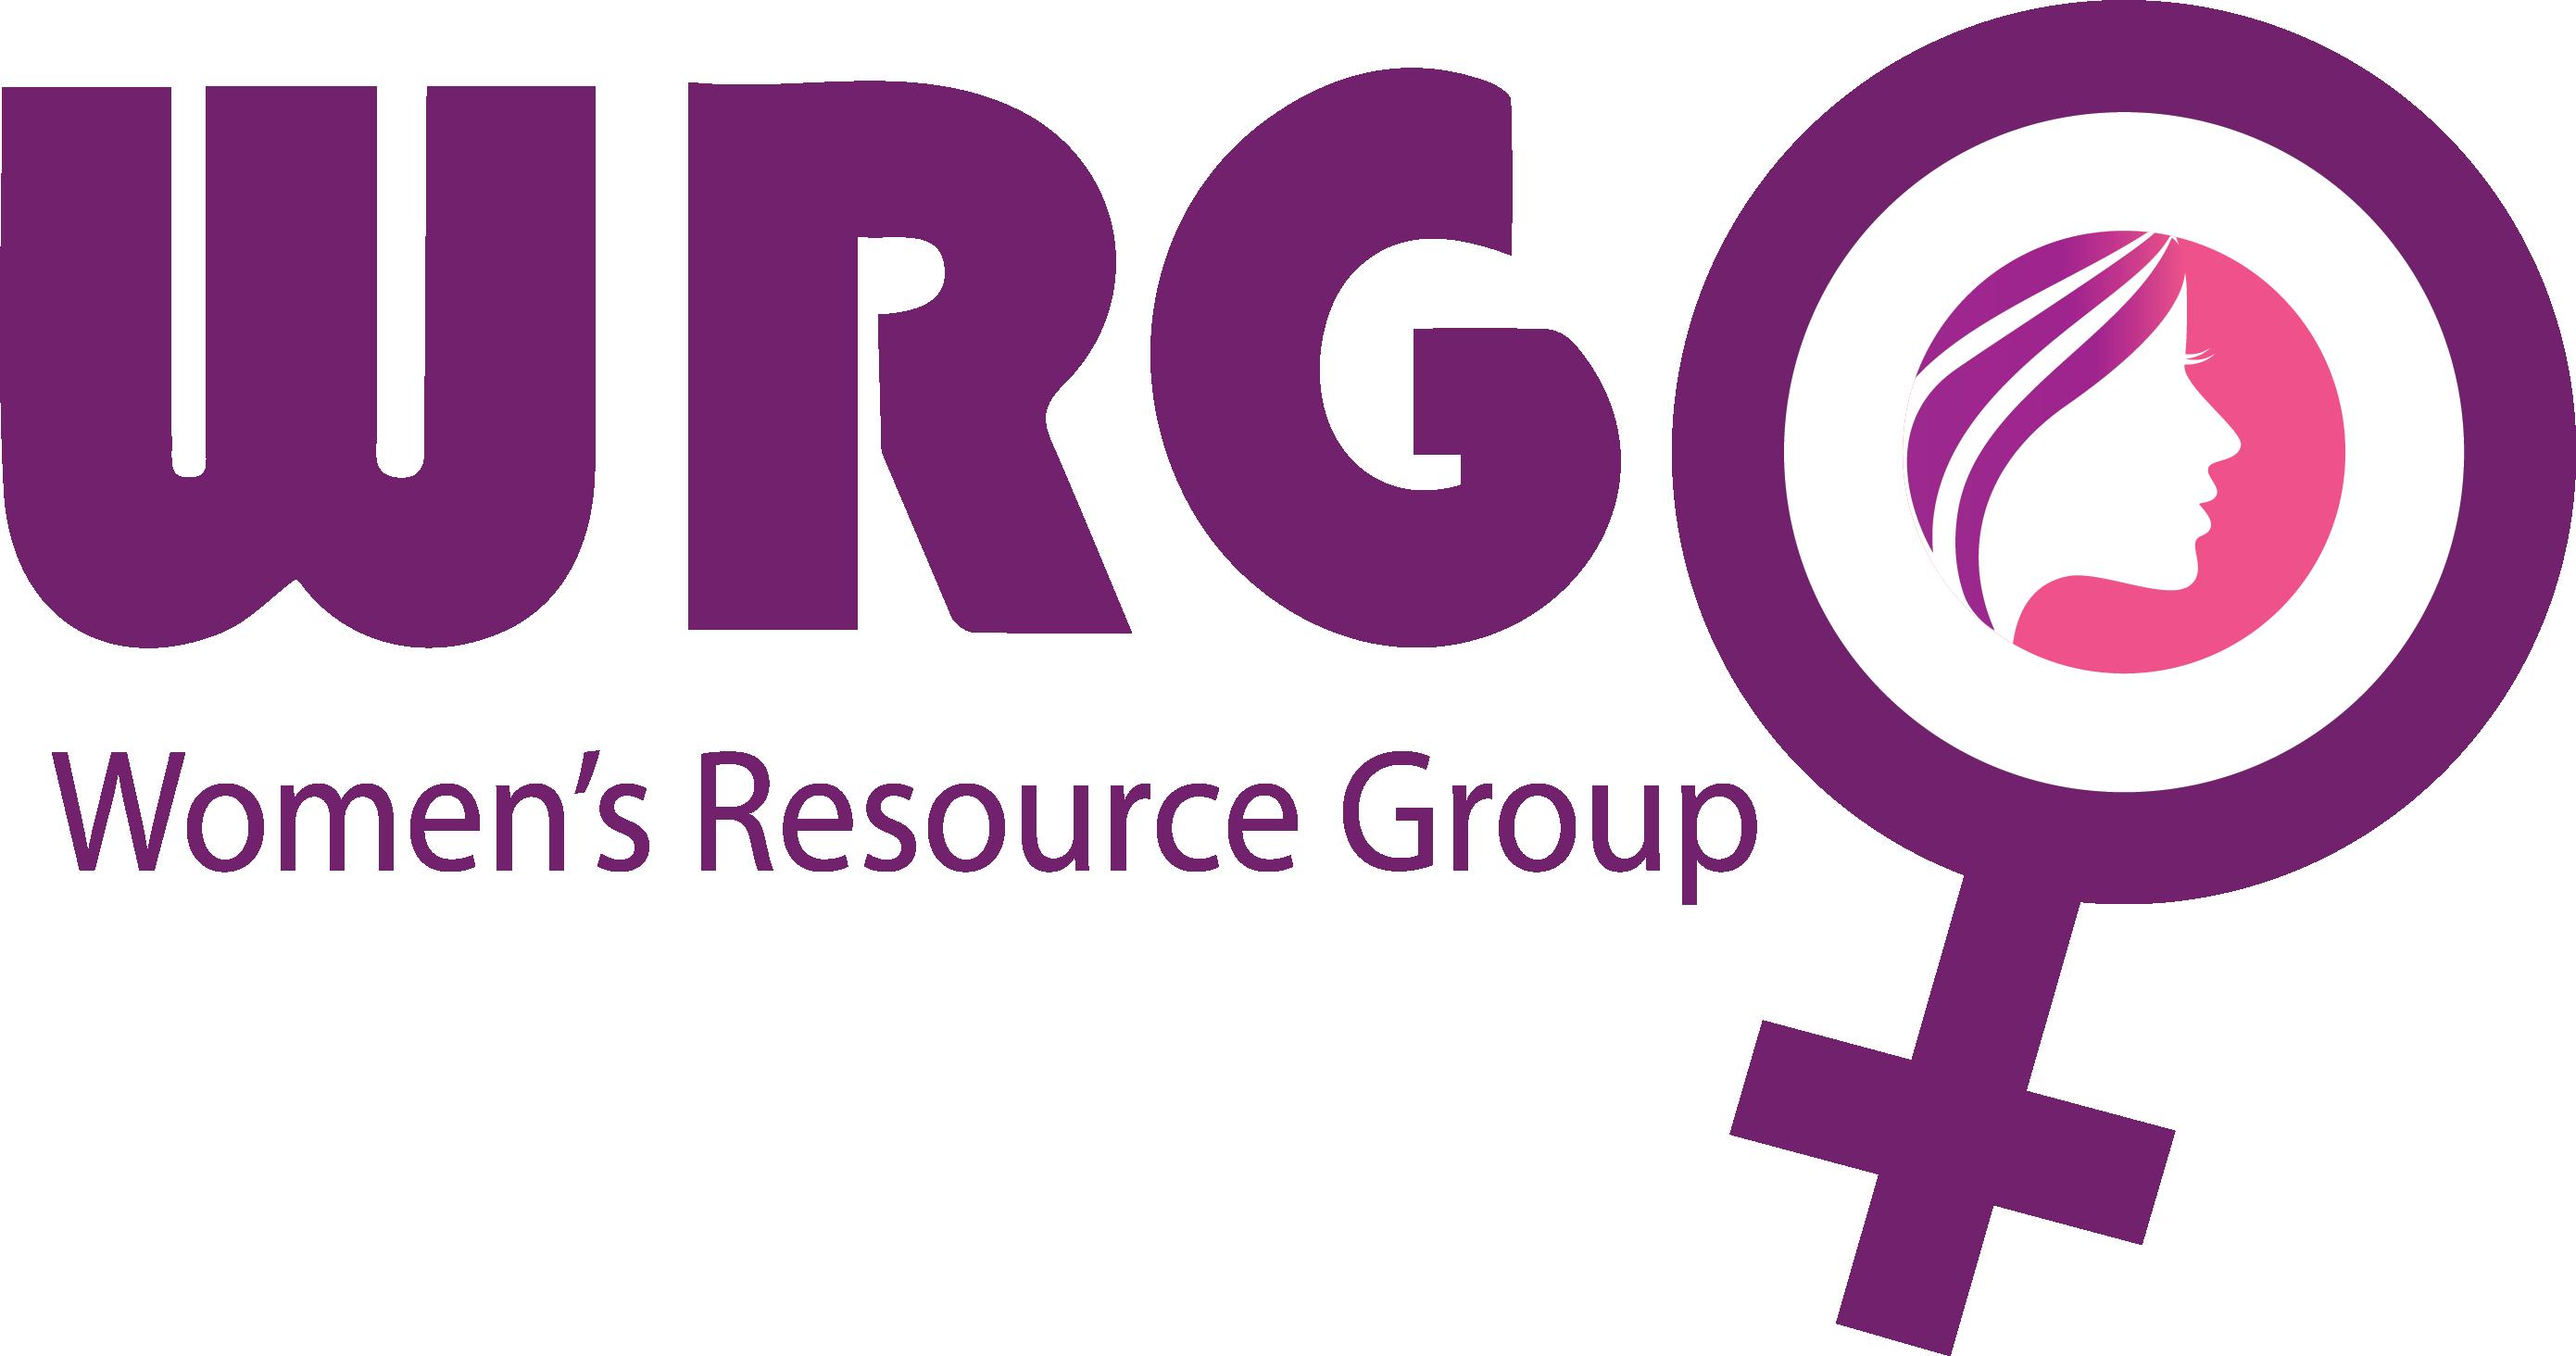 Women's Resource Group logo